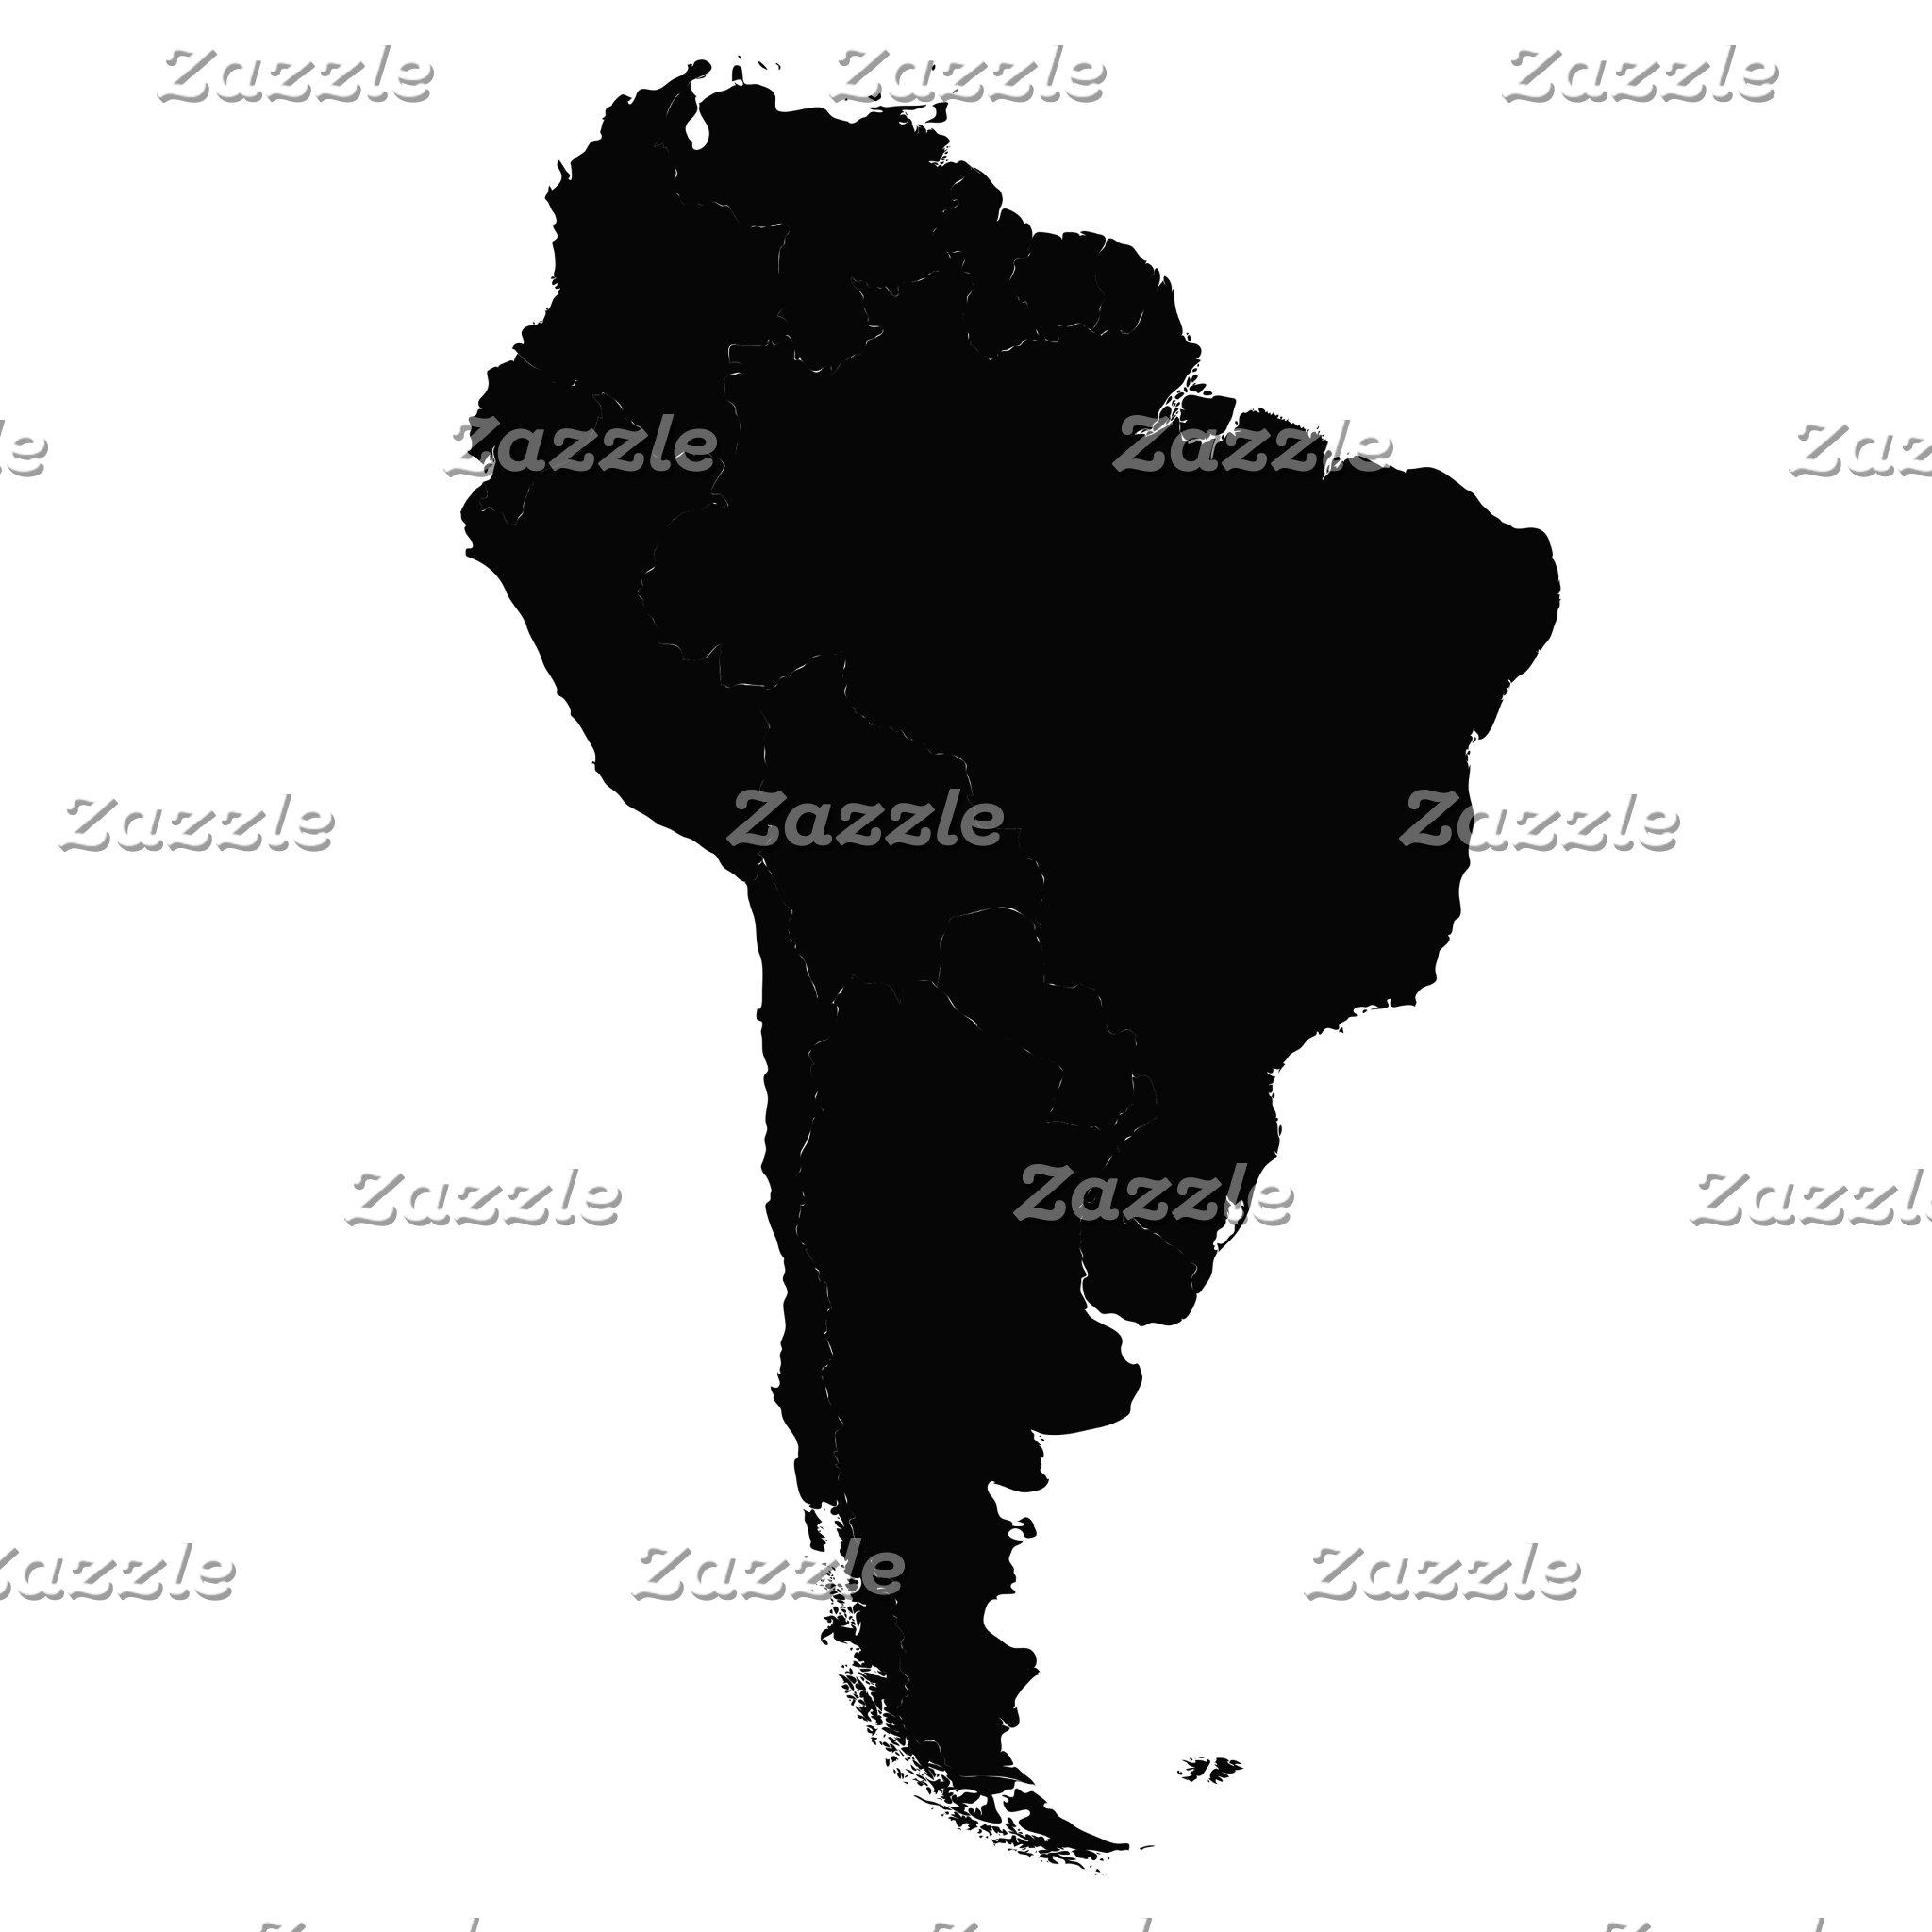 ► SOUTH AMERICA